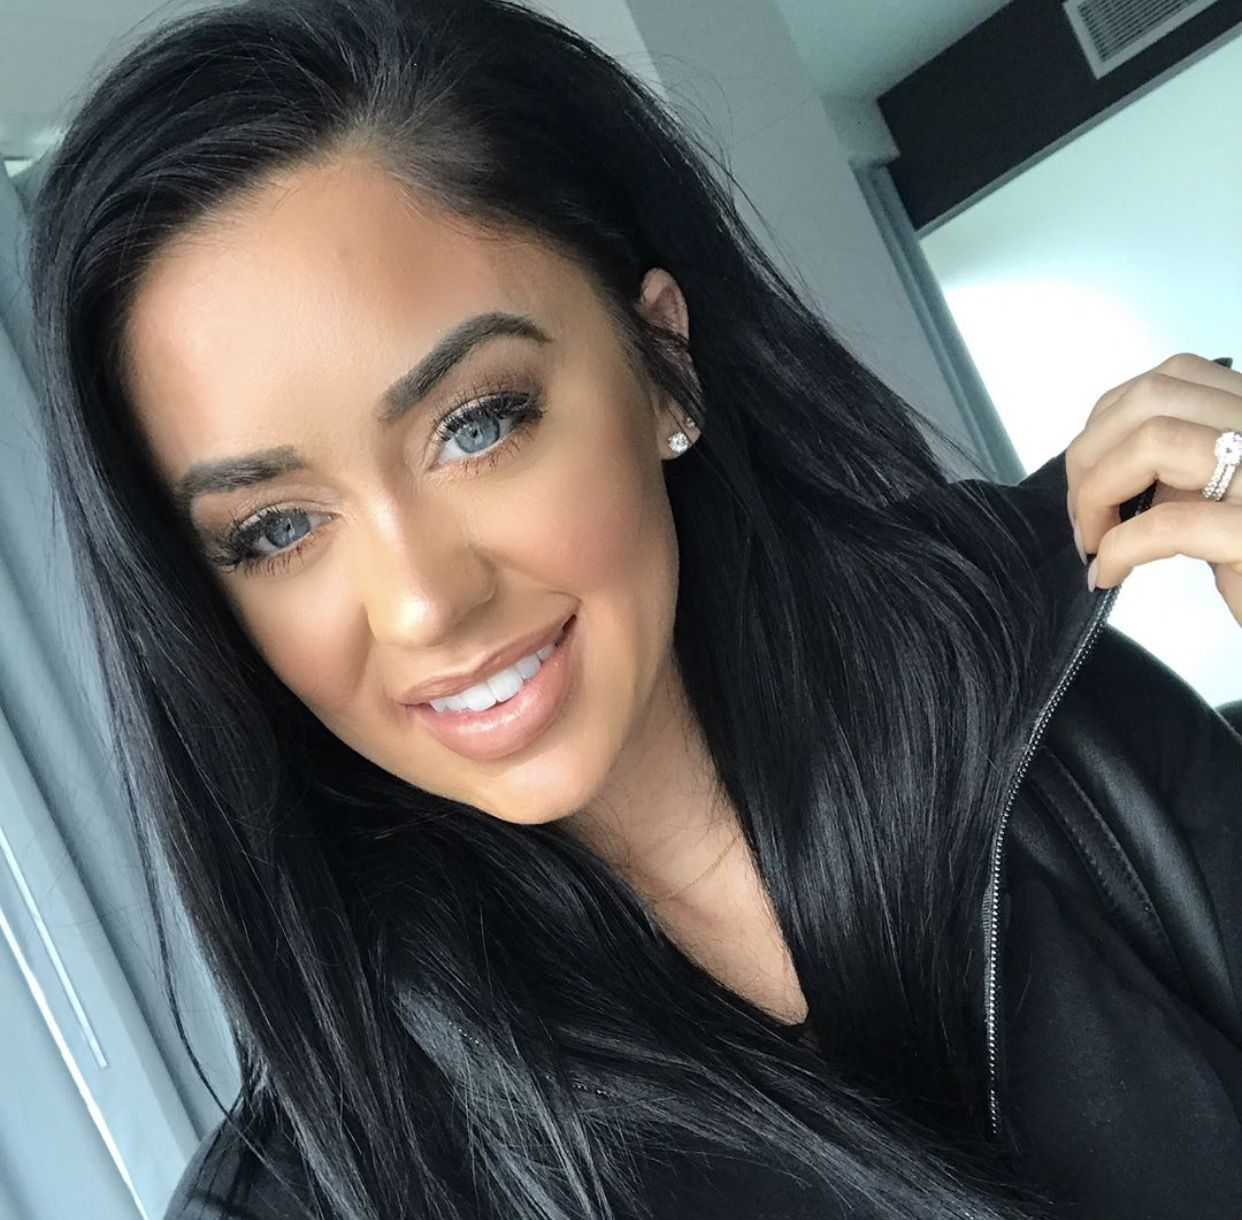 pin by marisol meza on make-up | dark hair blue eyes, katy